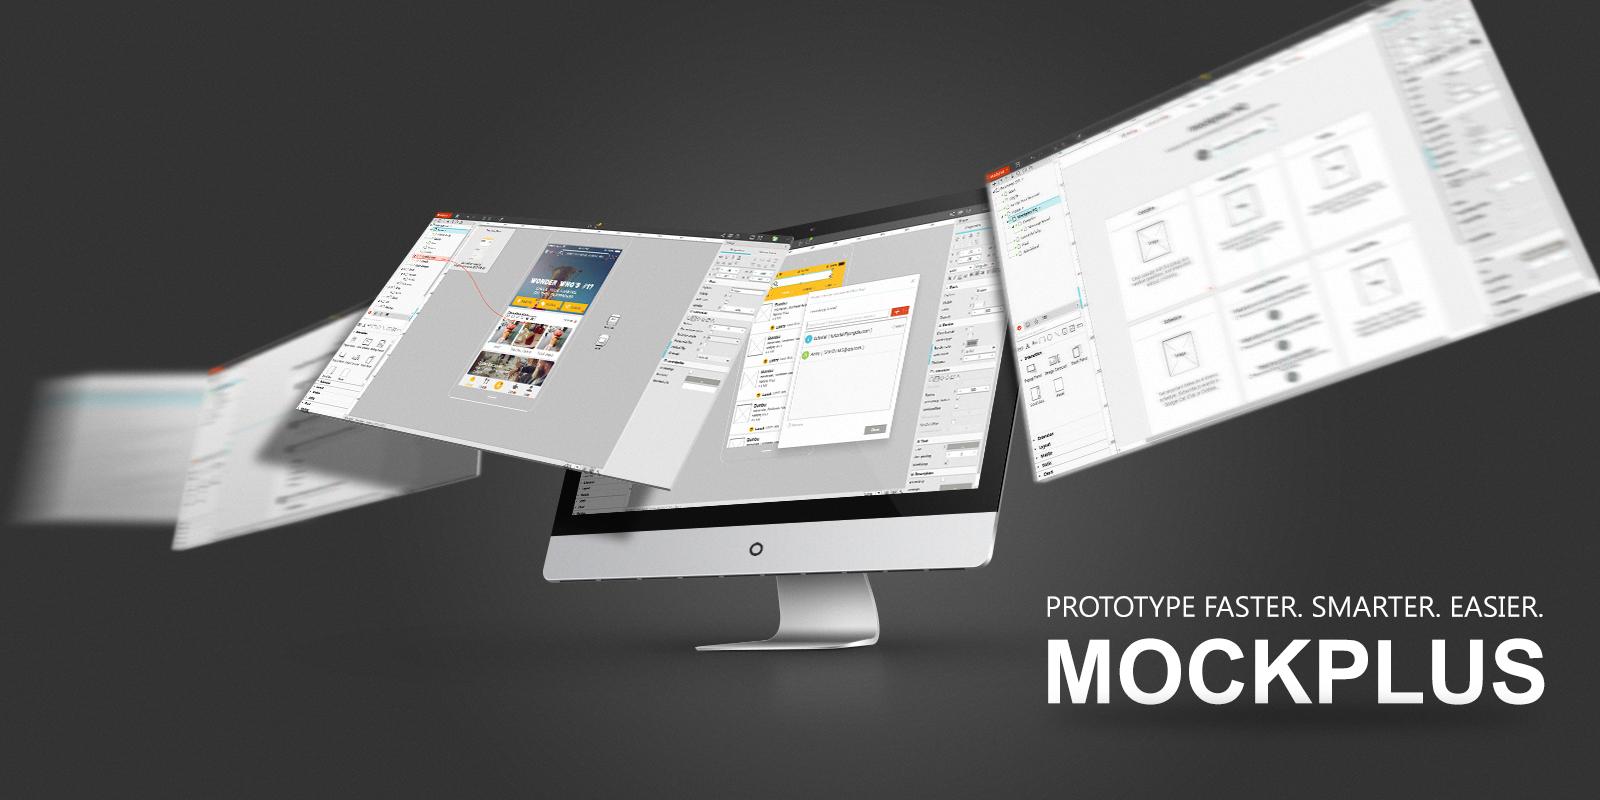 Website mockup for mobile devices in Mockplus